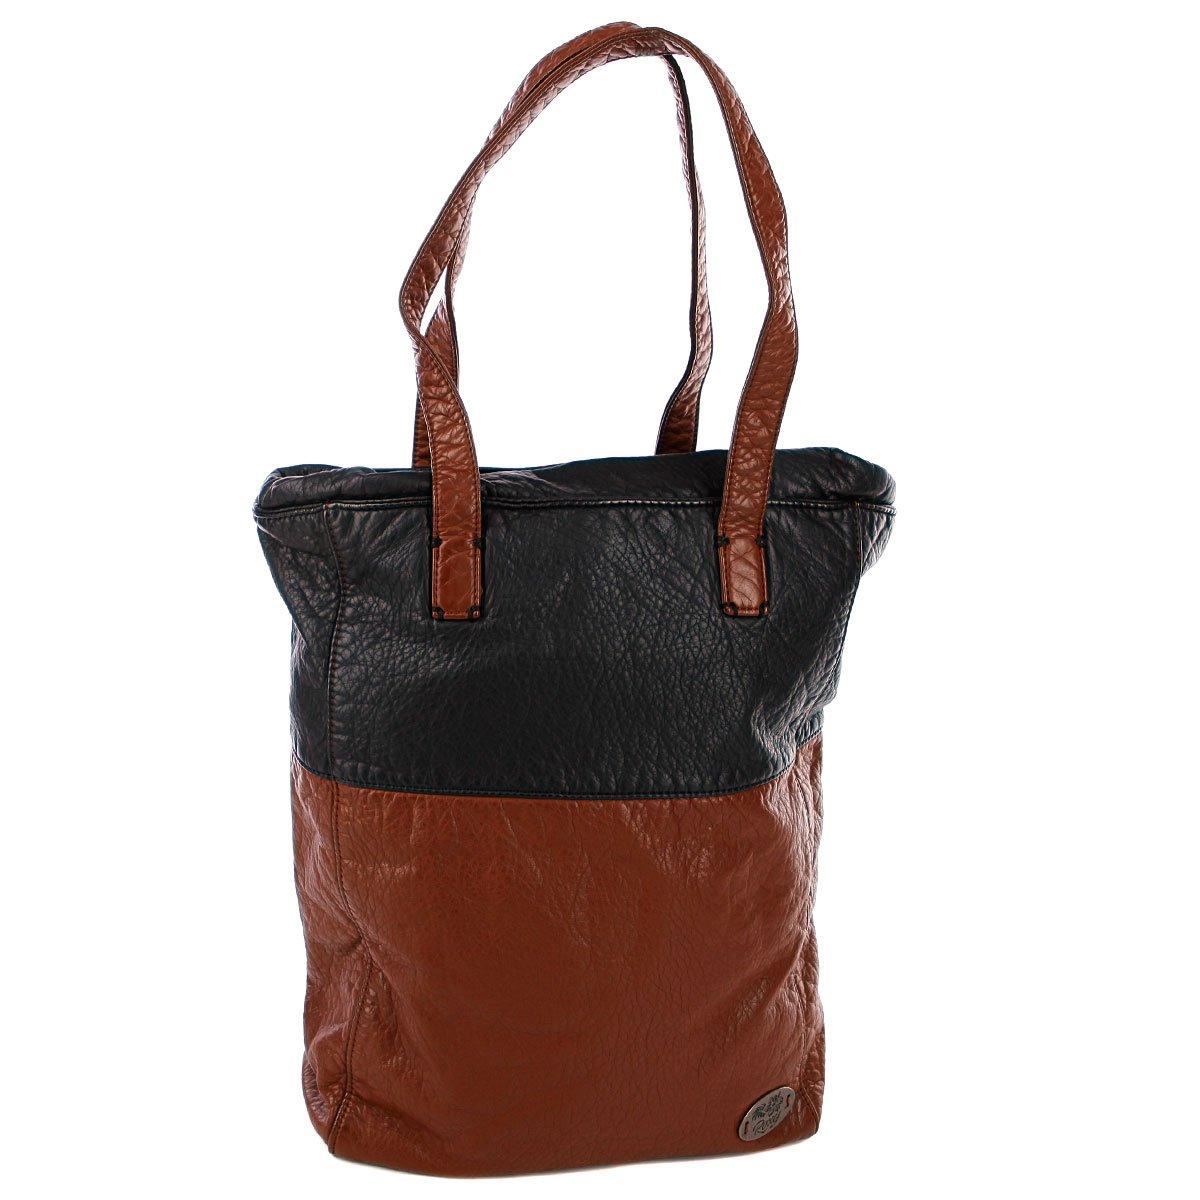 Купить сумку женскую Roxy Lucille B Camel (WTWBA1712) в интернет-магазине  Proskater.by 23307bfc524b8